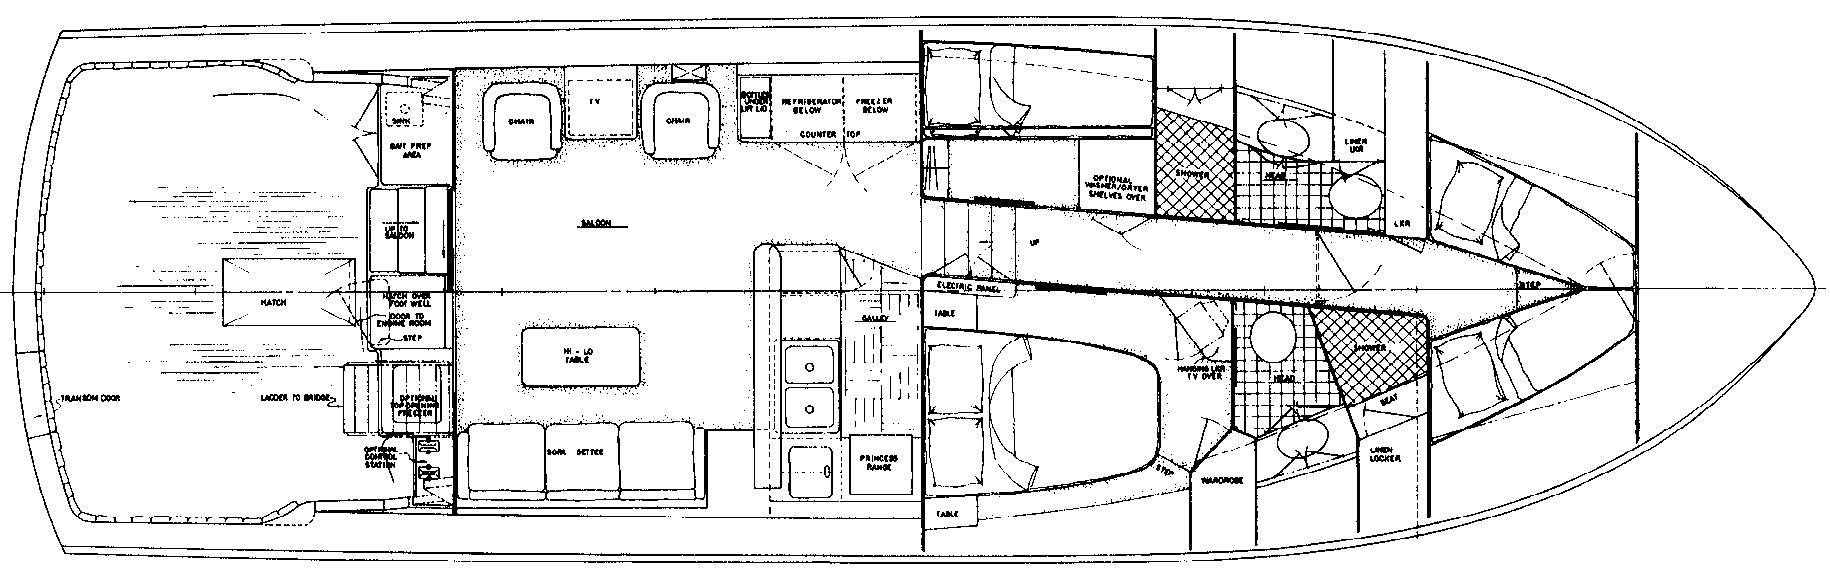 50 Sportfisherman Floor Plan 1